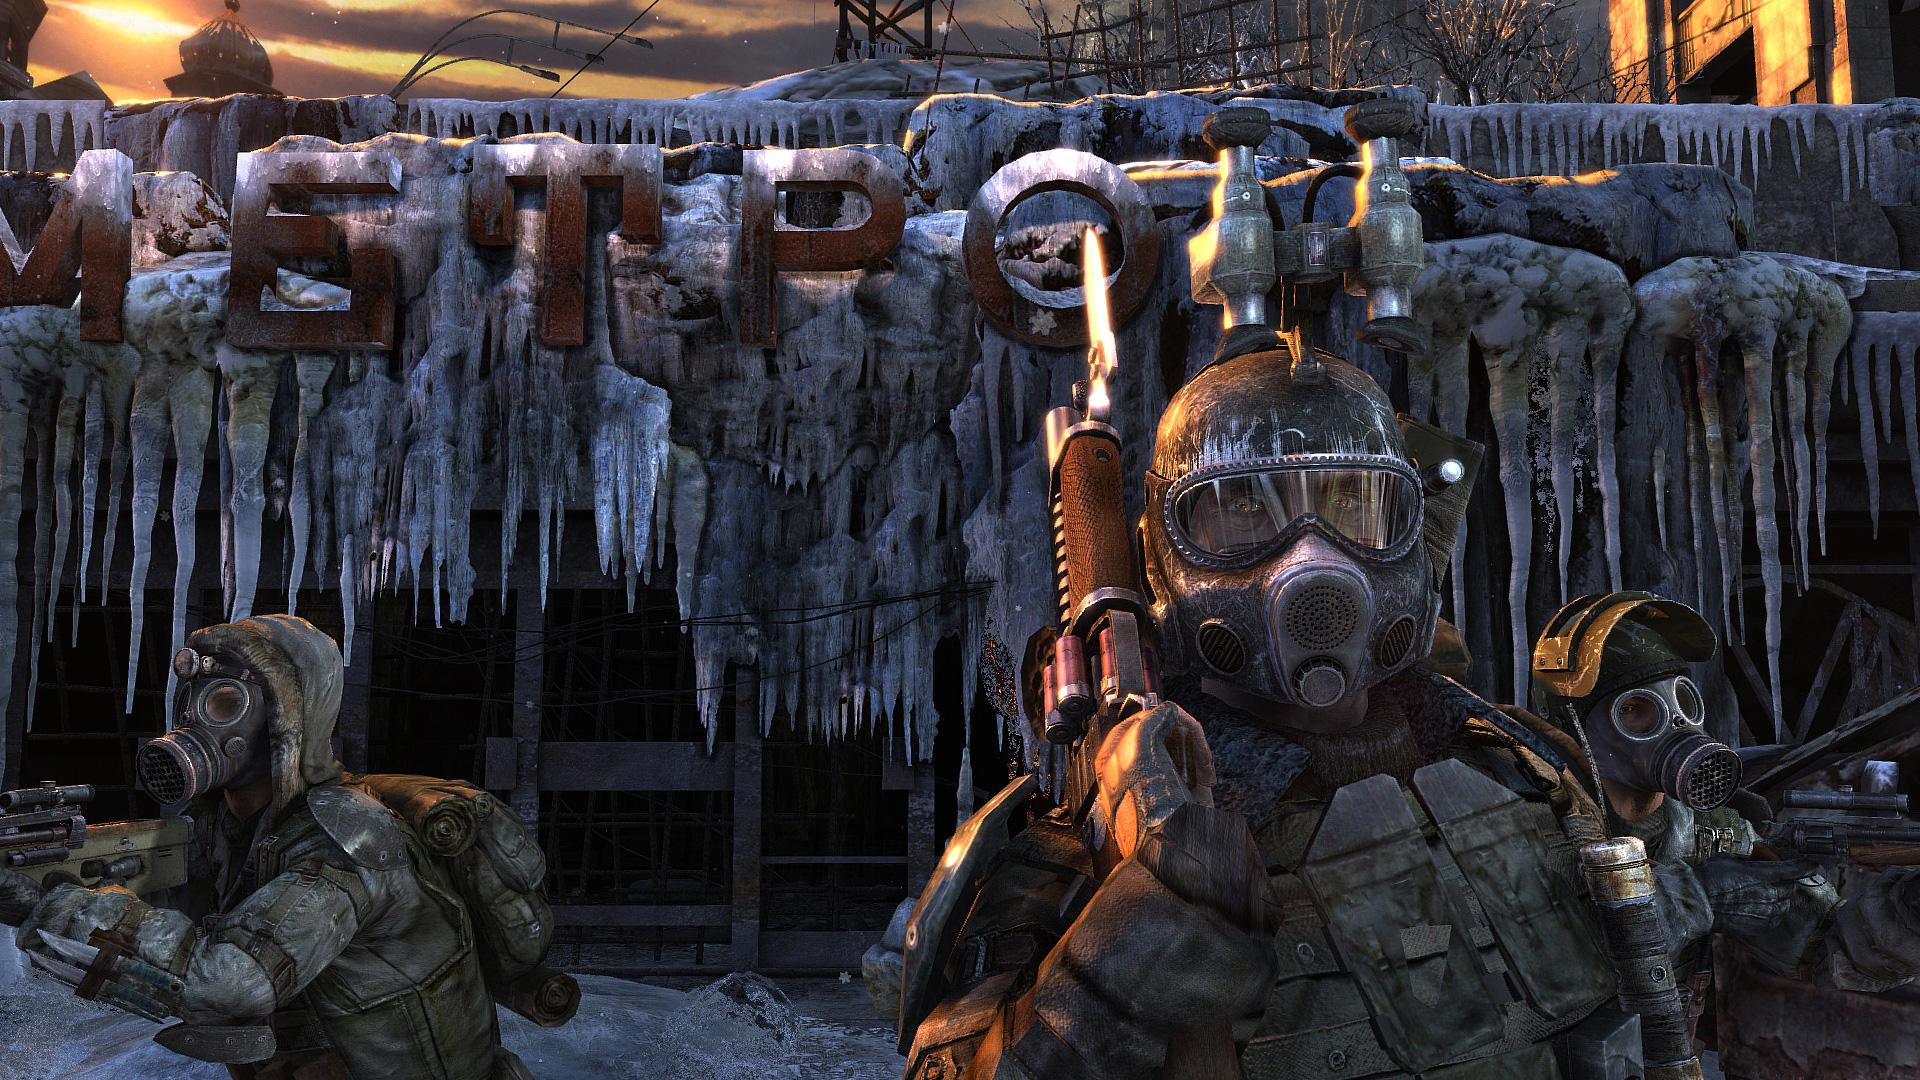 The original version of Metro 2033 is free to keep on Steam screenshot